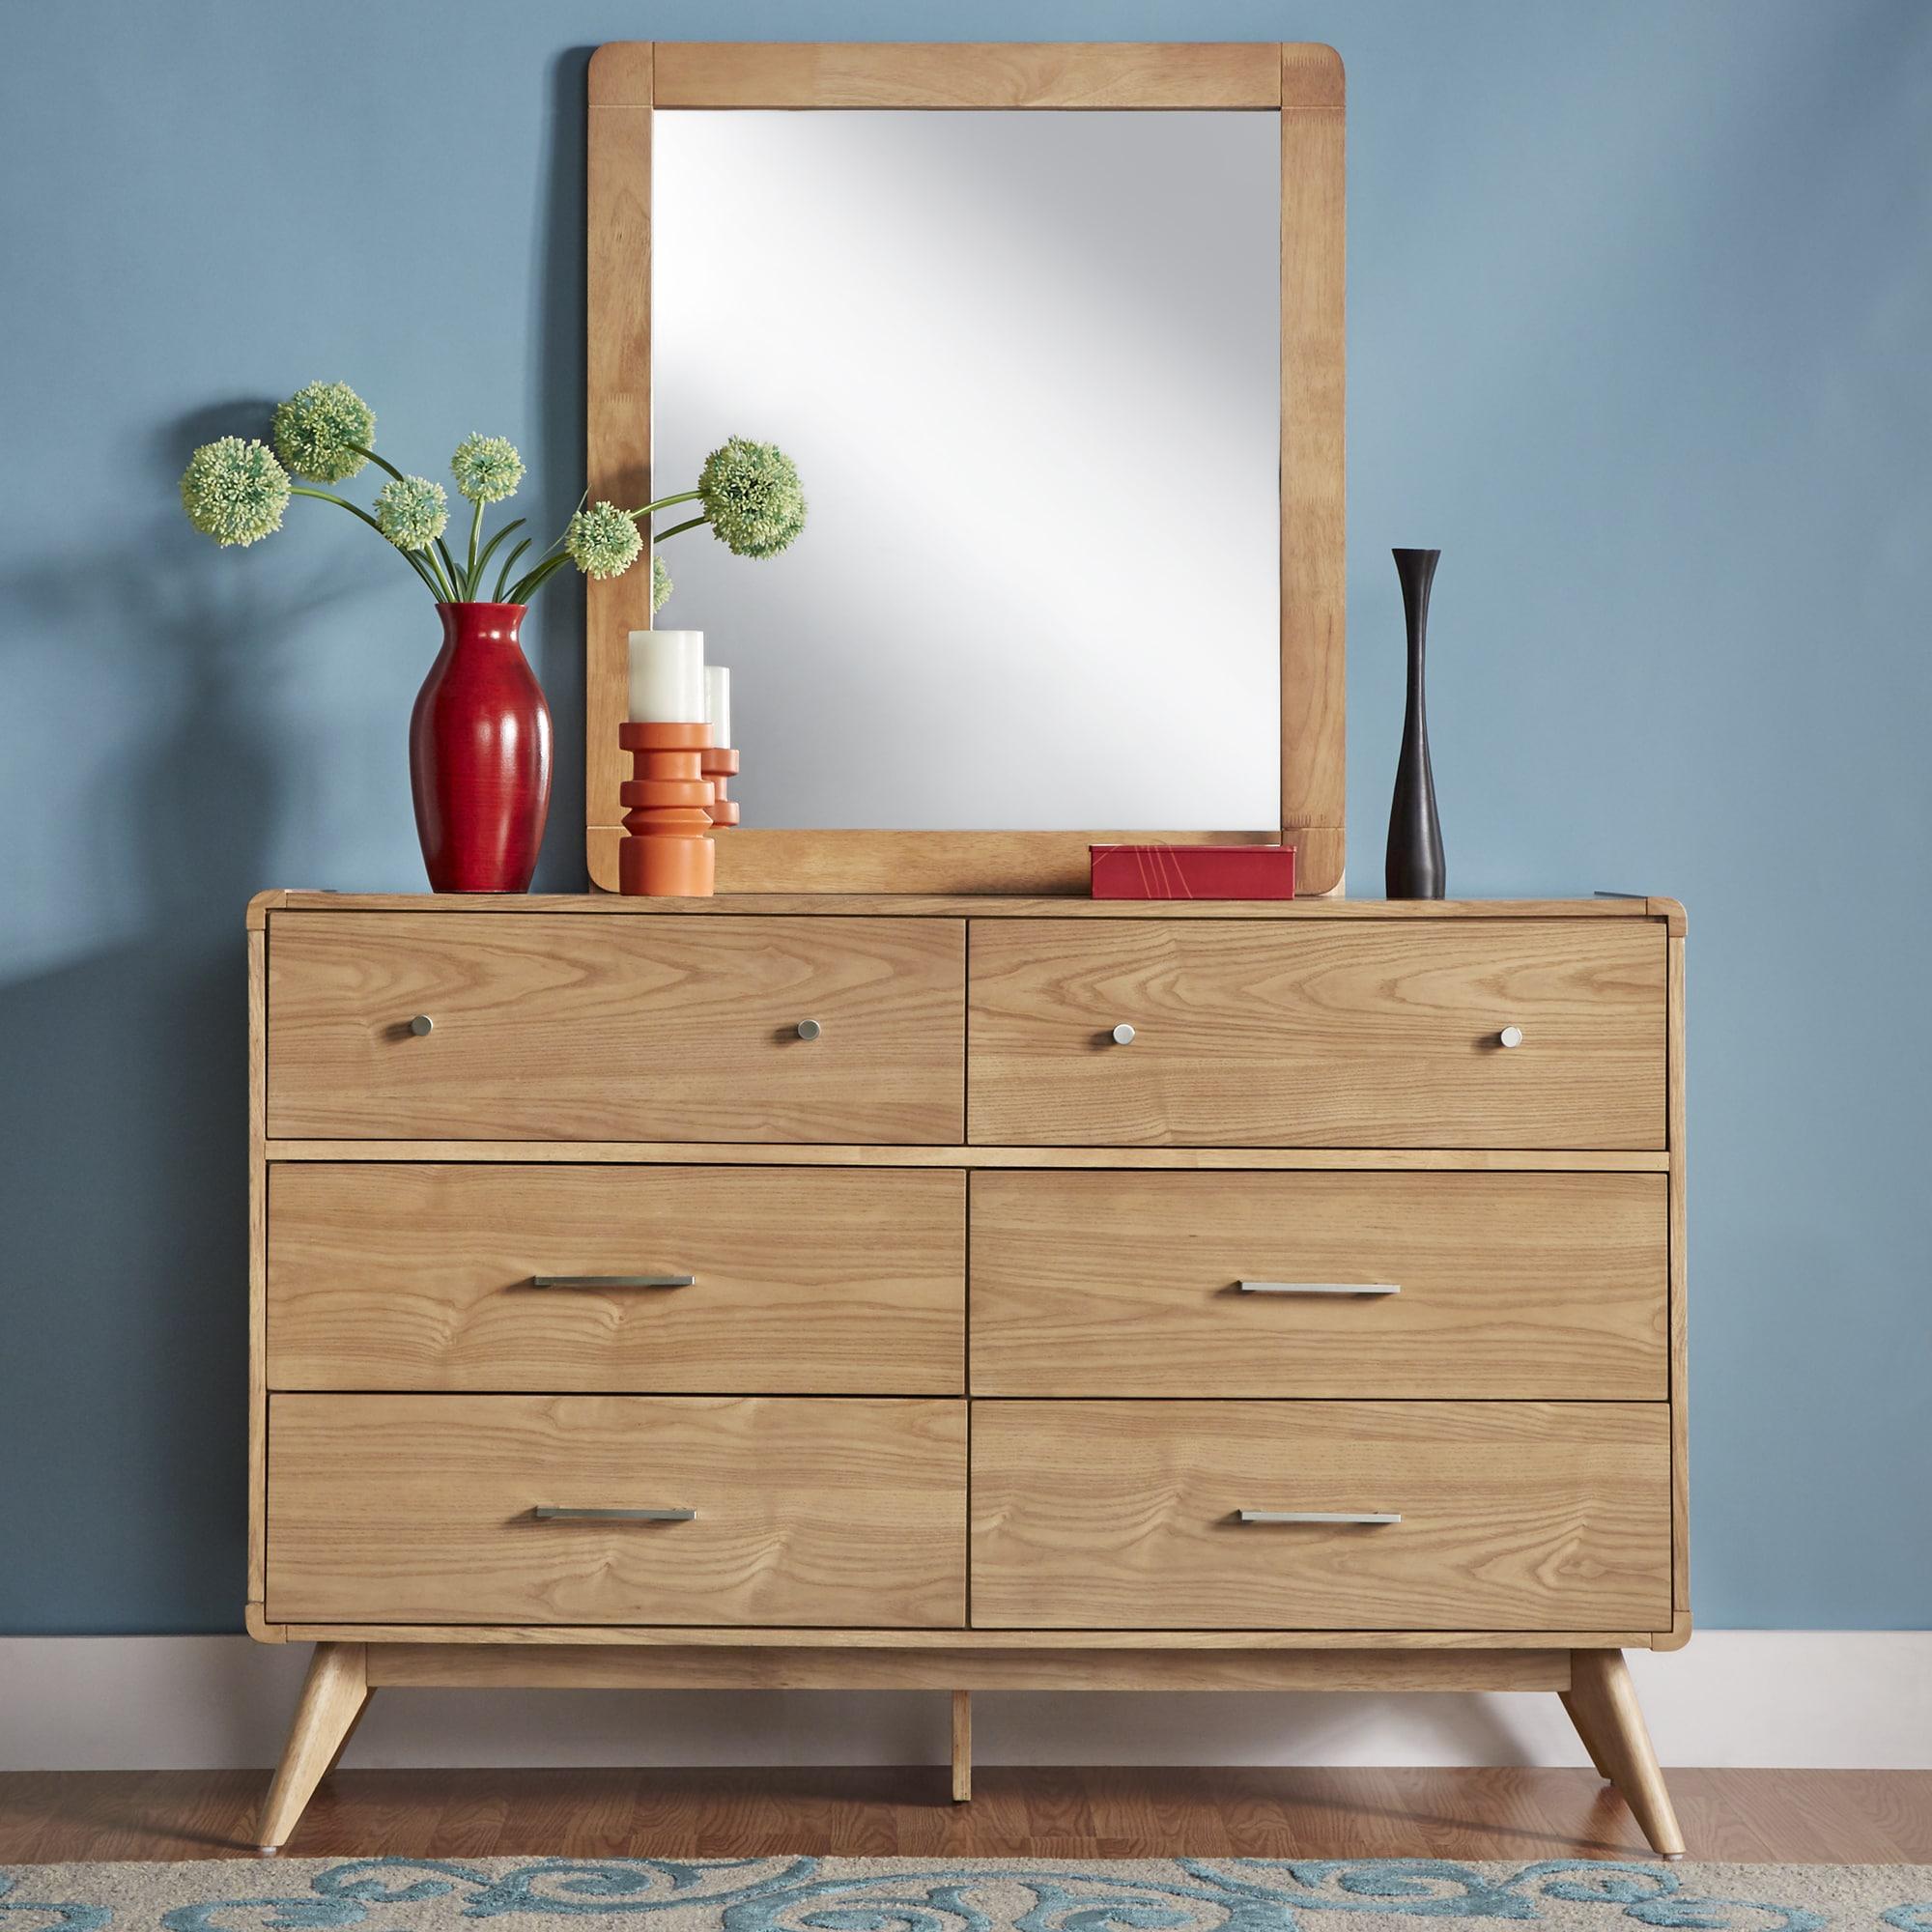 Penelope-Danish-Modern-Curved-6-drawer-Dresser-iNSPIRE-